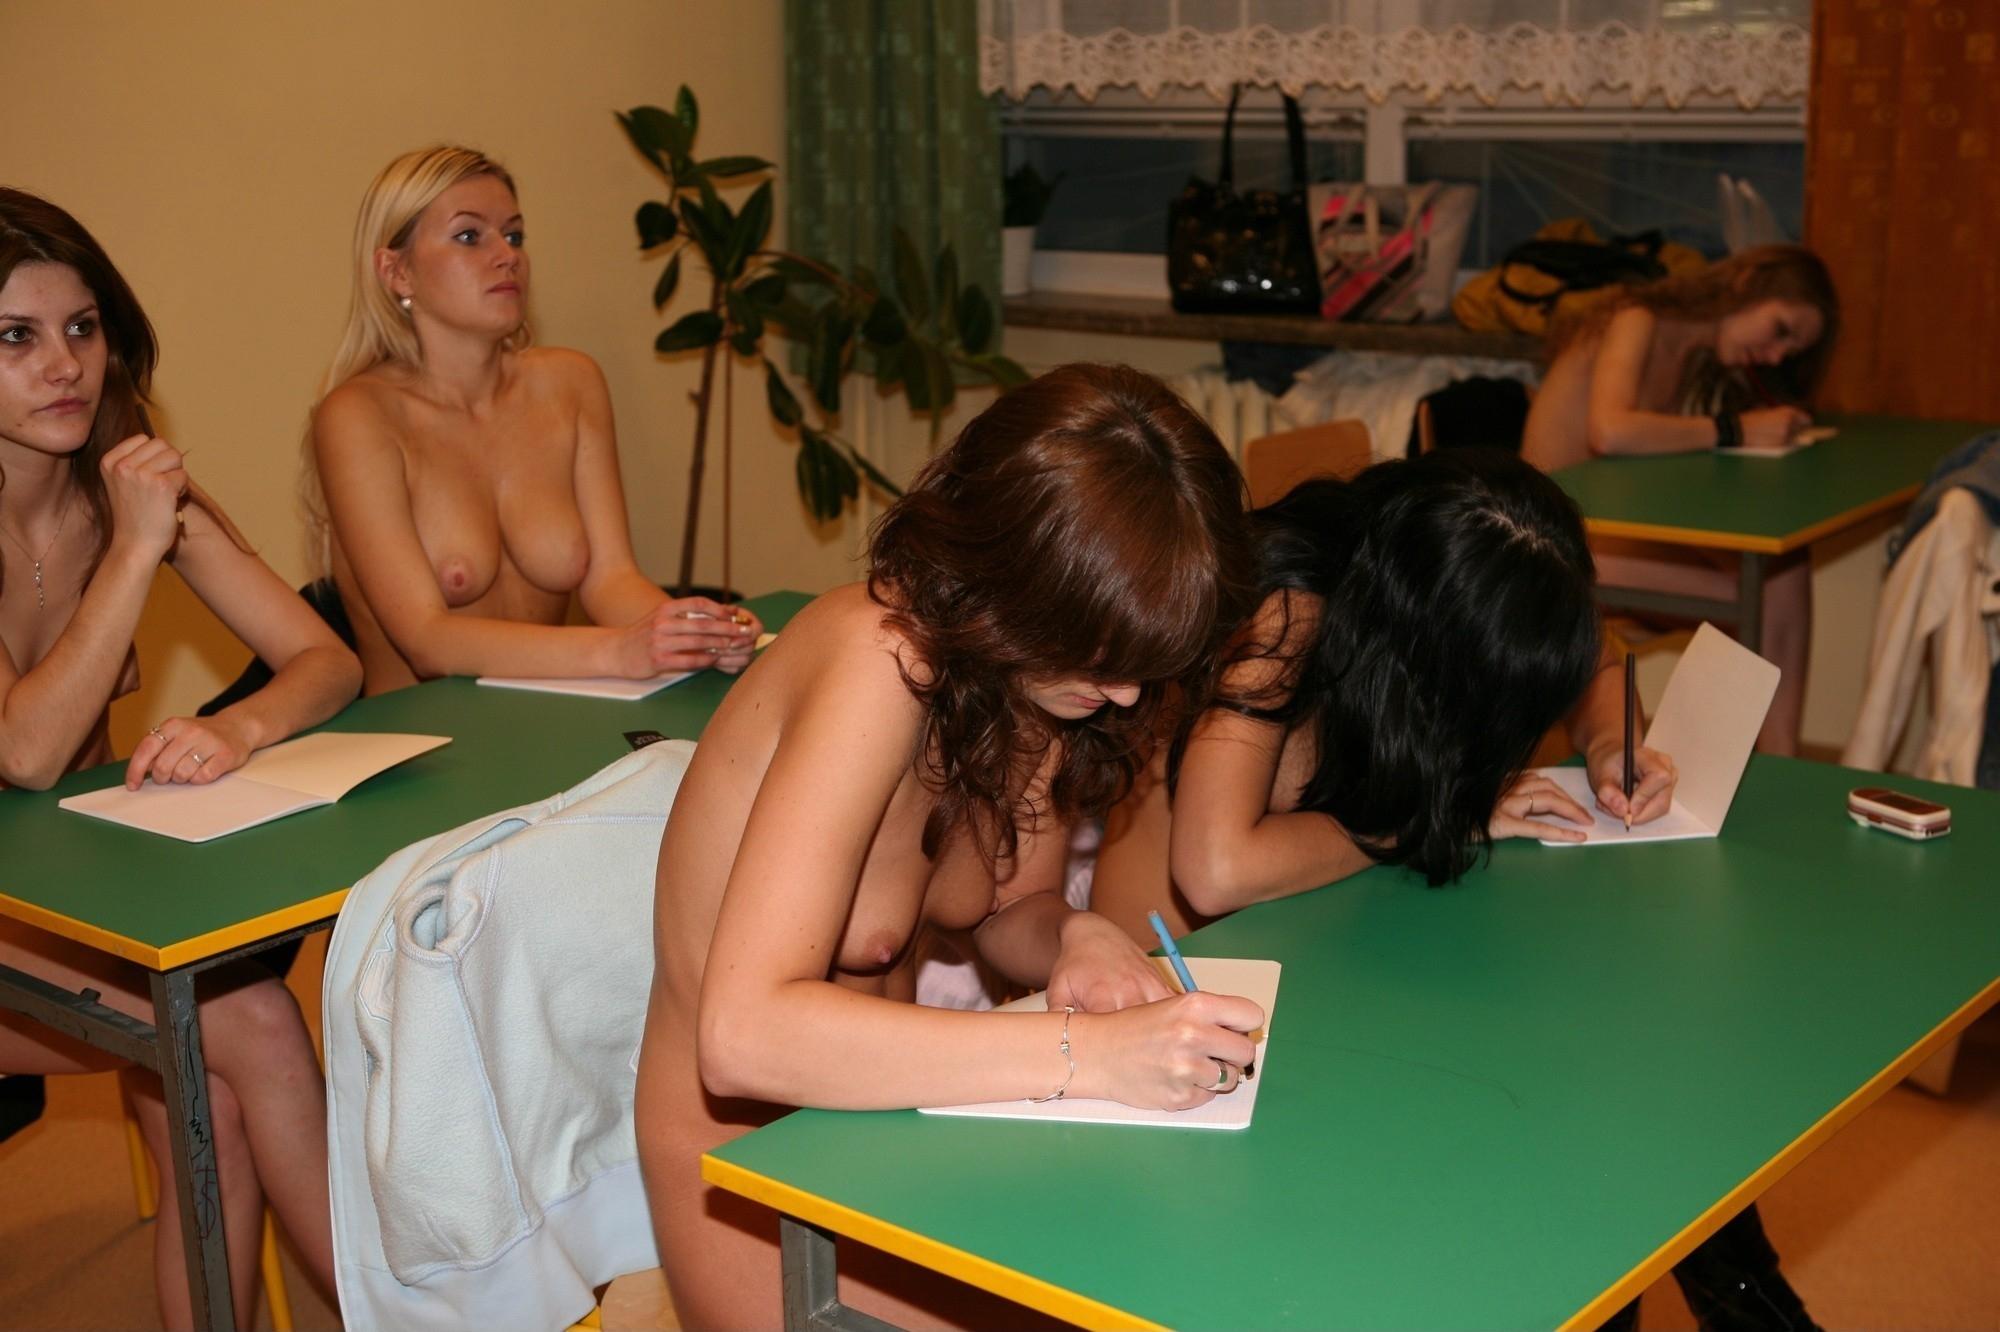 Вшколе урок нудистов фото 498-702